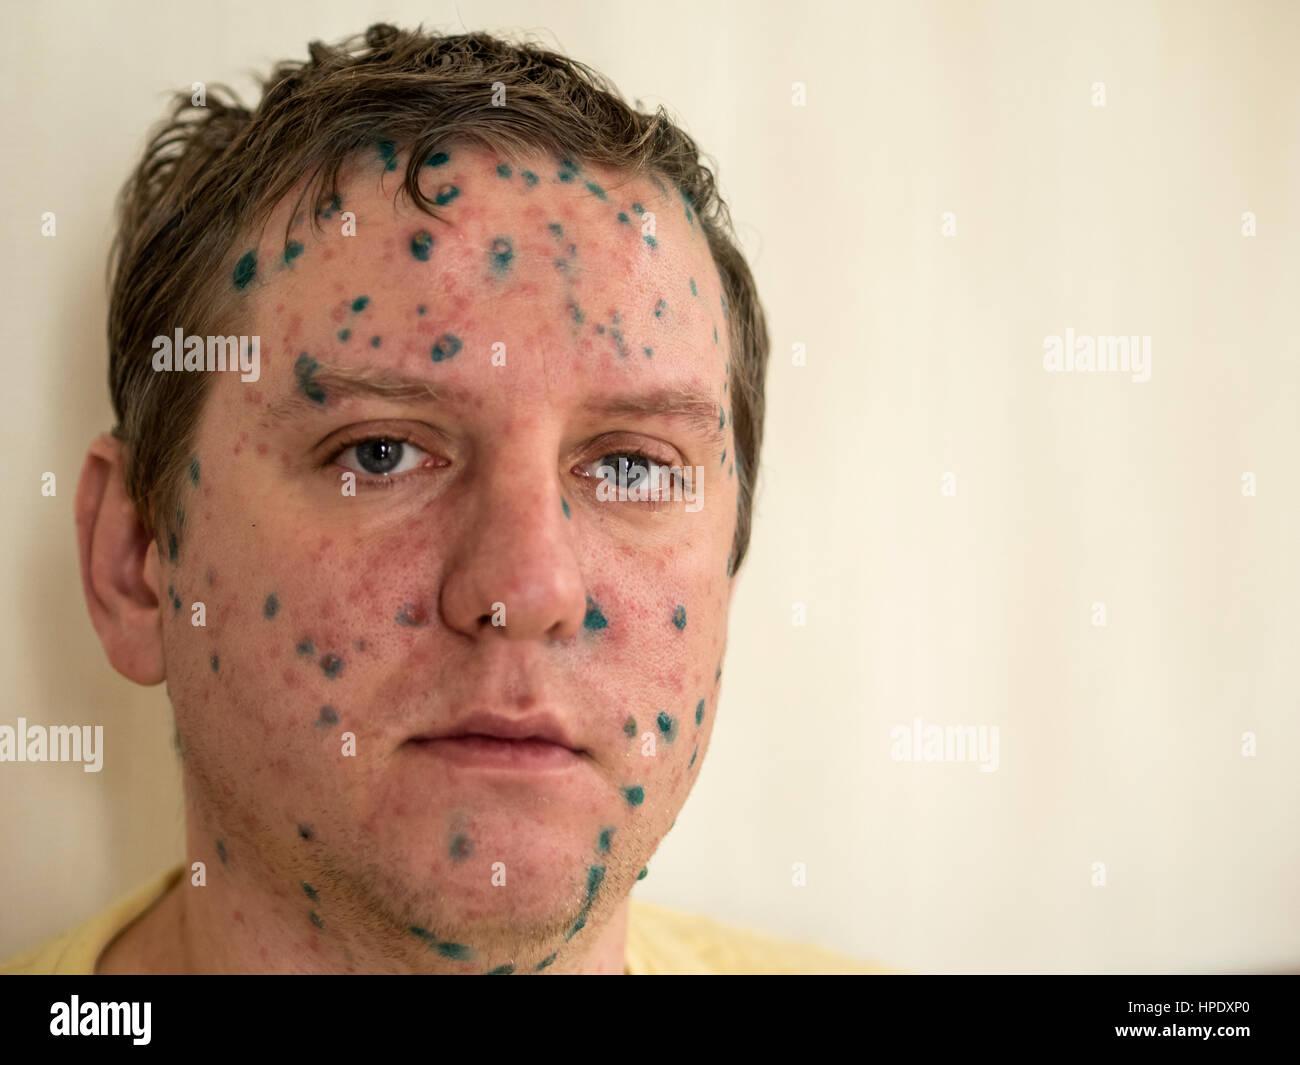 Facial rashes on adults, allison miller porno stard